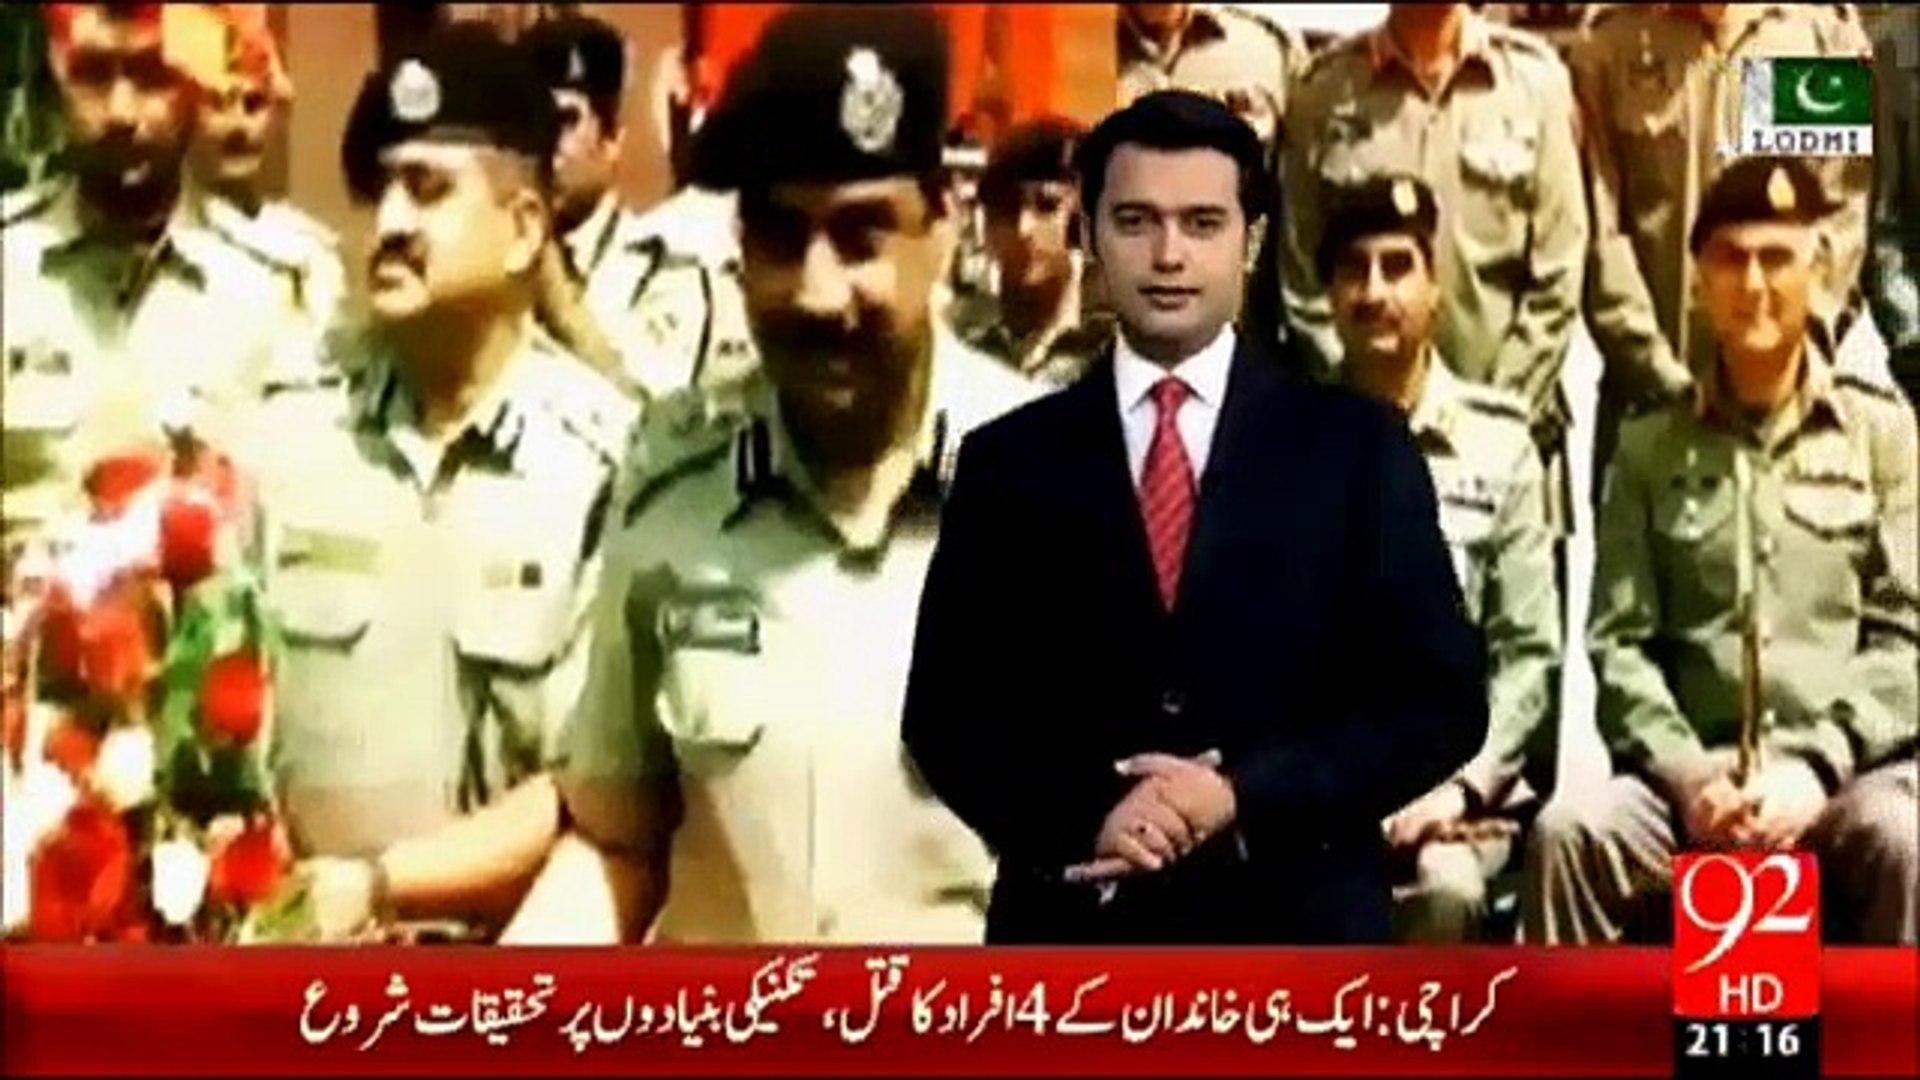 Stupid & Liar Indian Media Venom Spitting As Pakistan, India Border Chiefs Discuss Border &